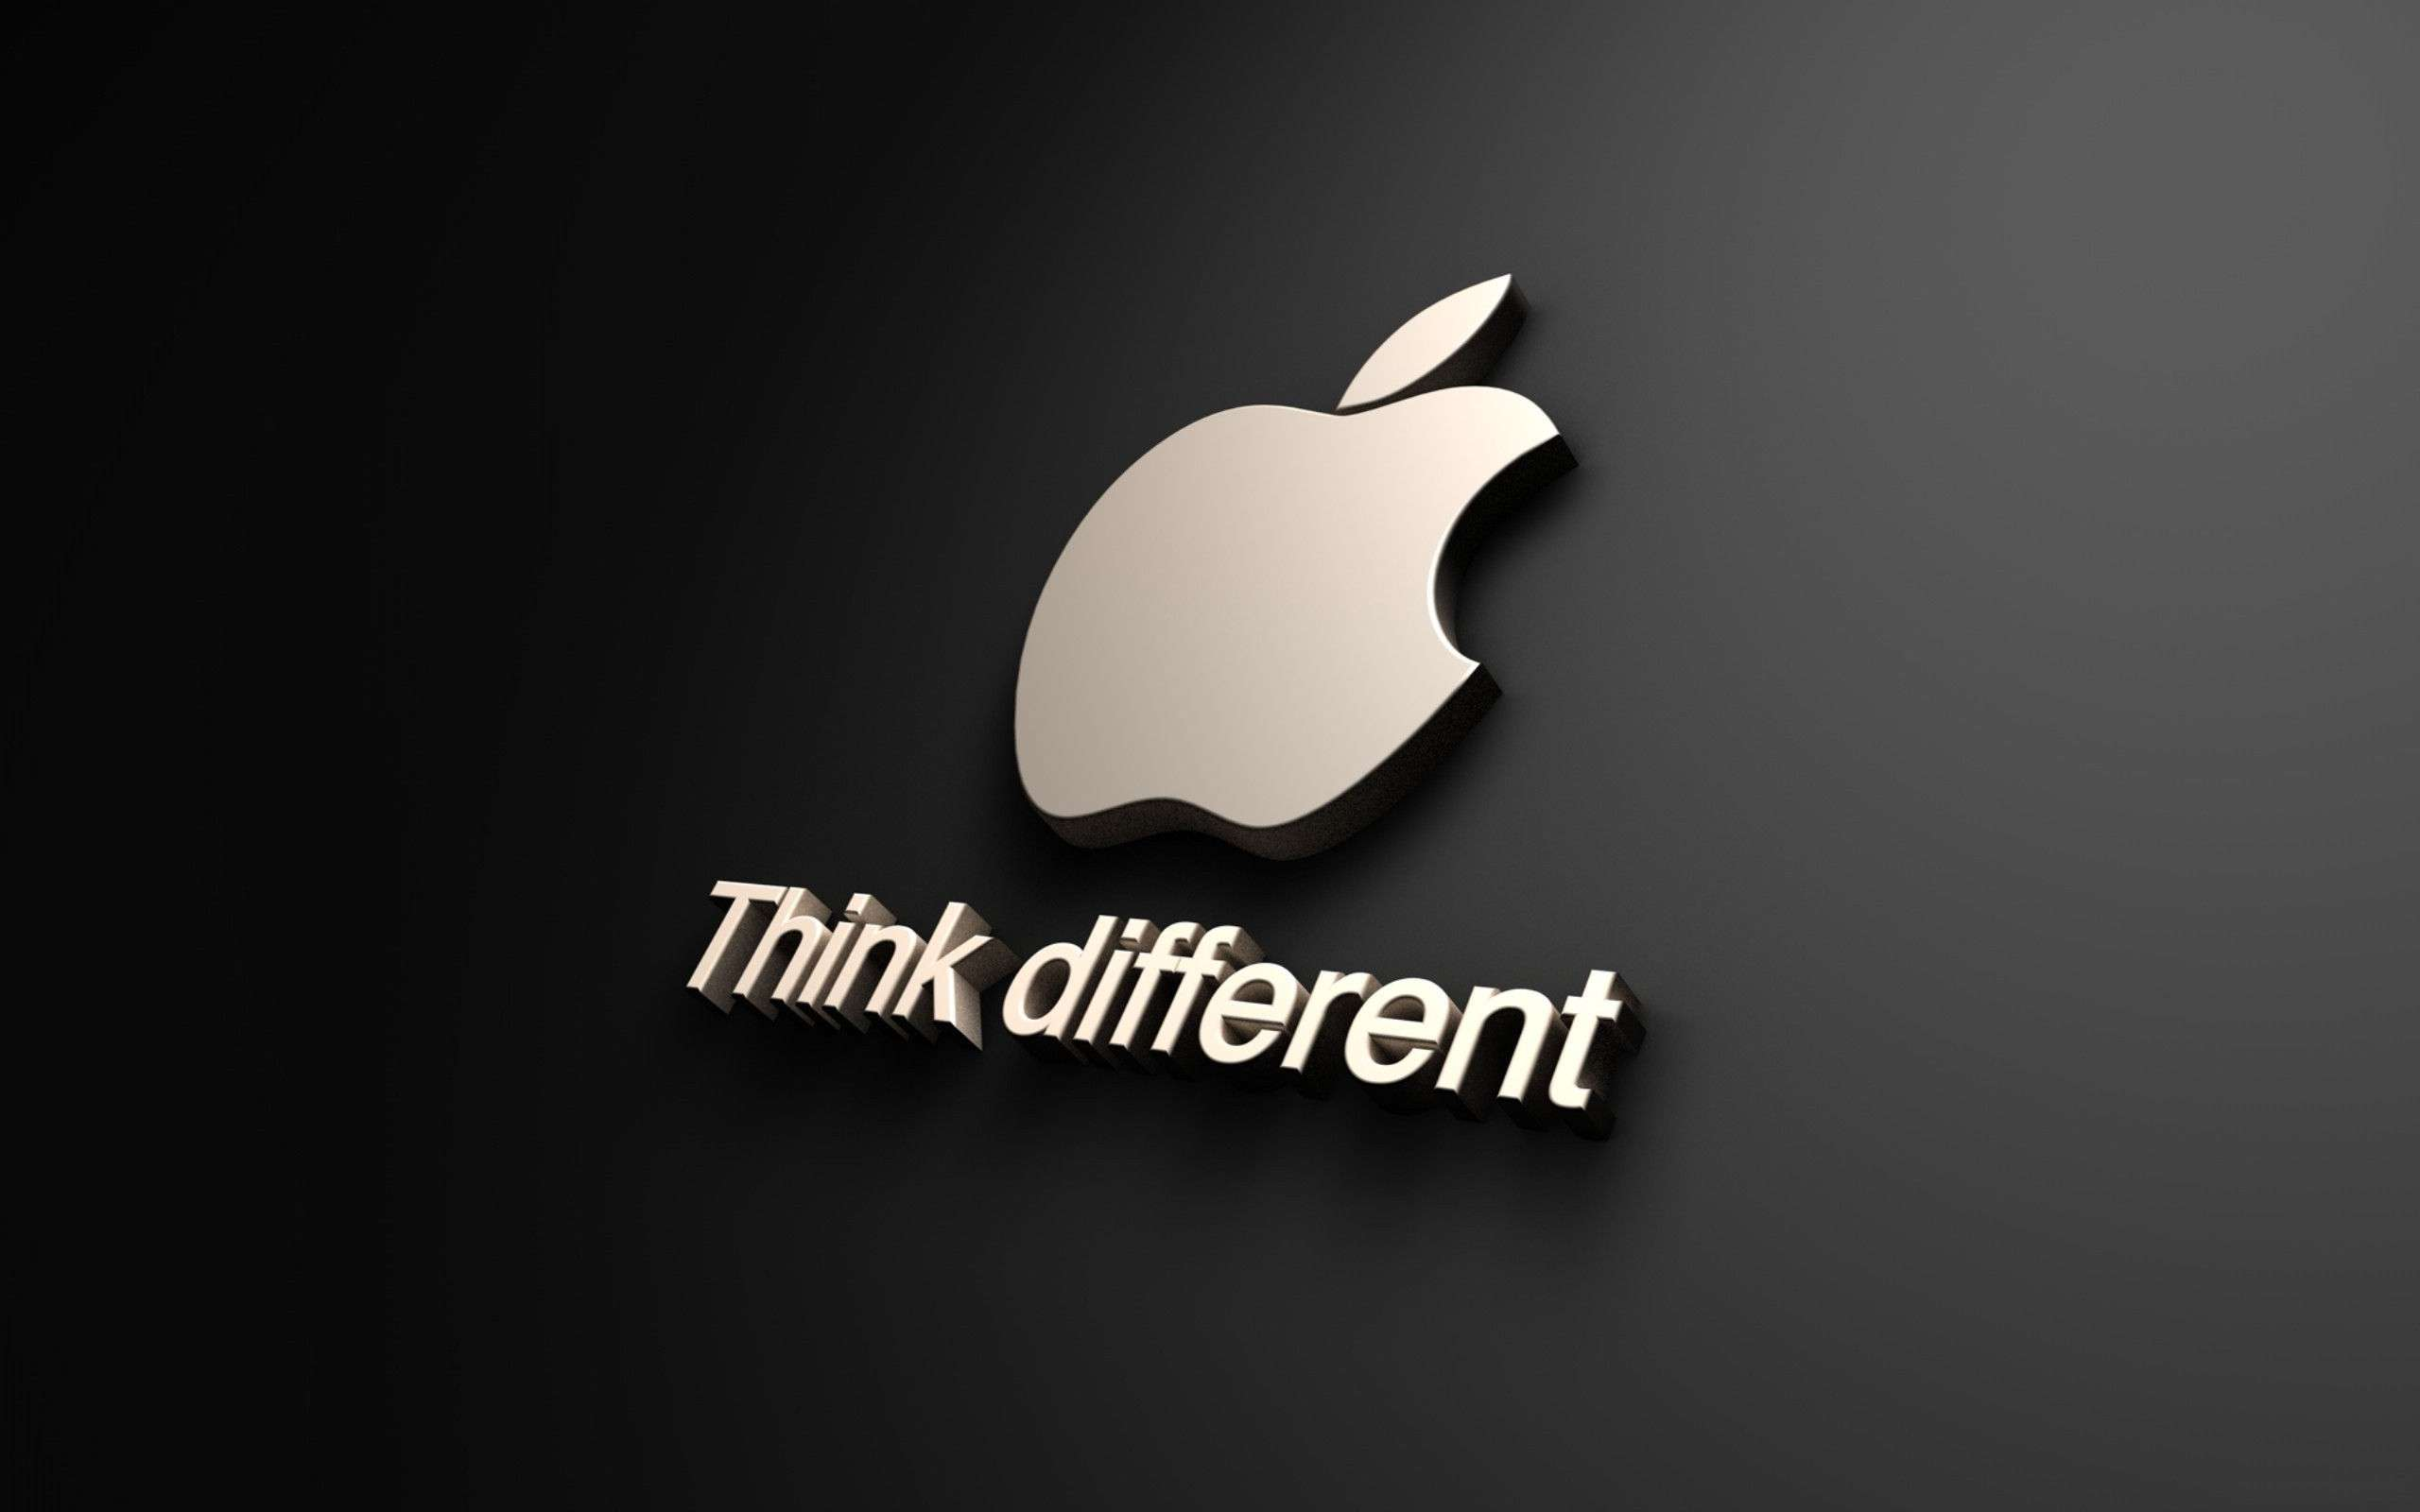 Apple Computer Wallpaper 046